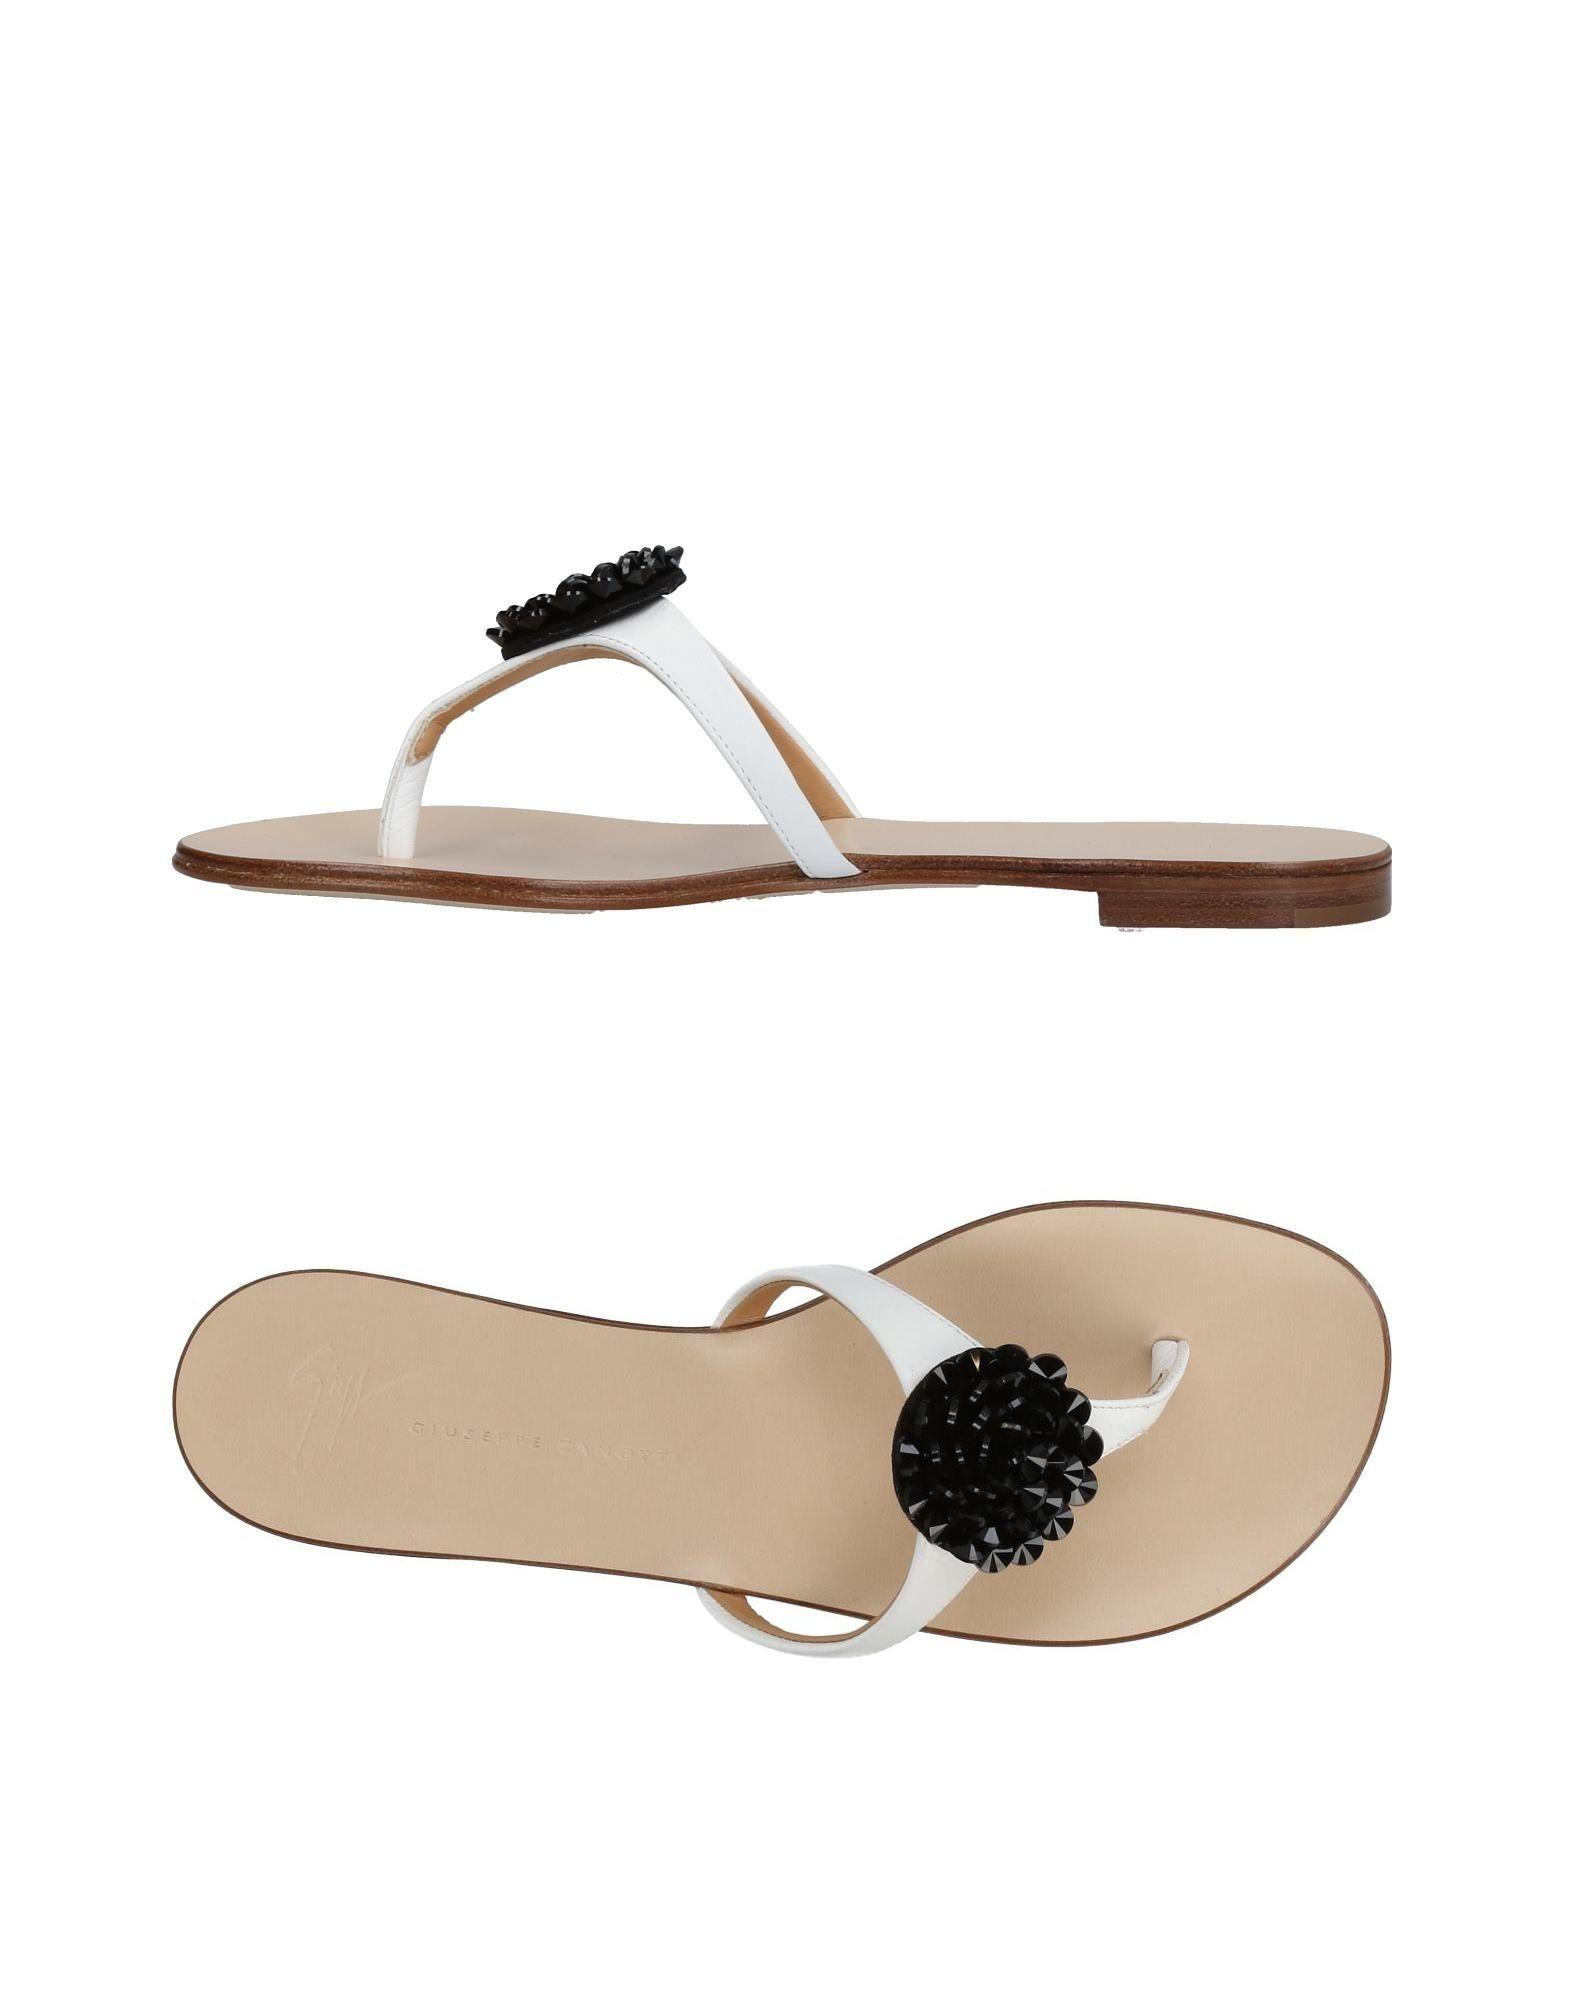 Giuseppe Zanotti Dianetten Damen  11444254RIGut aussehende strapazierfähige Schuhe